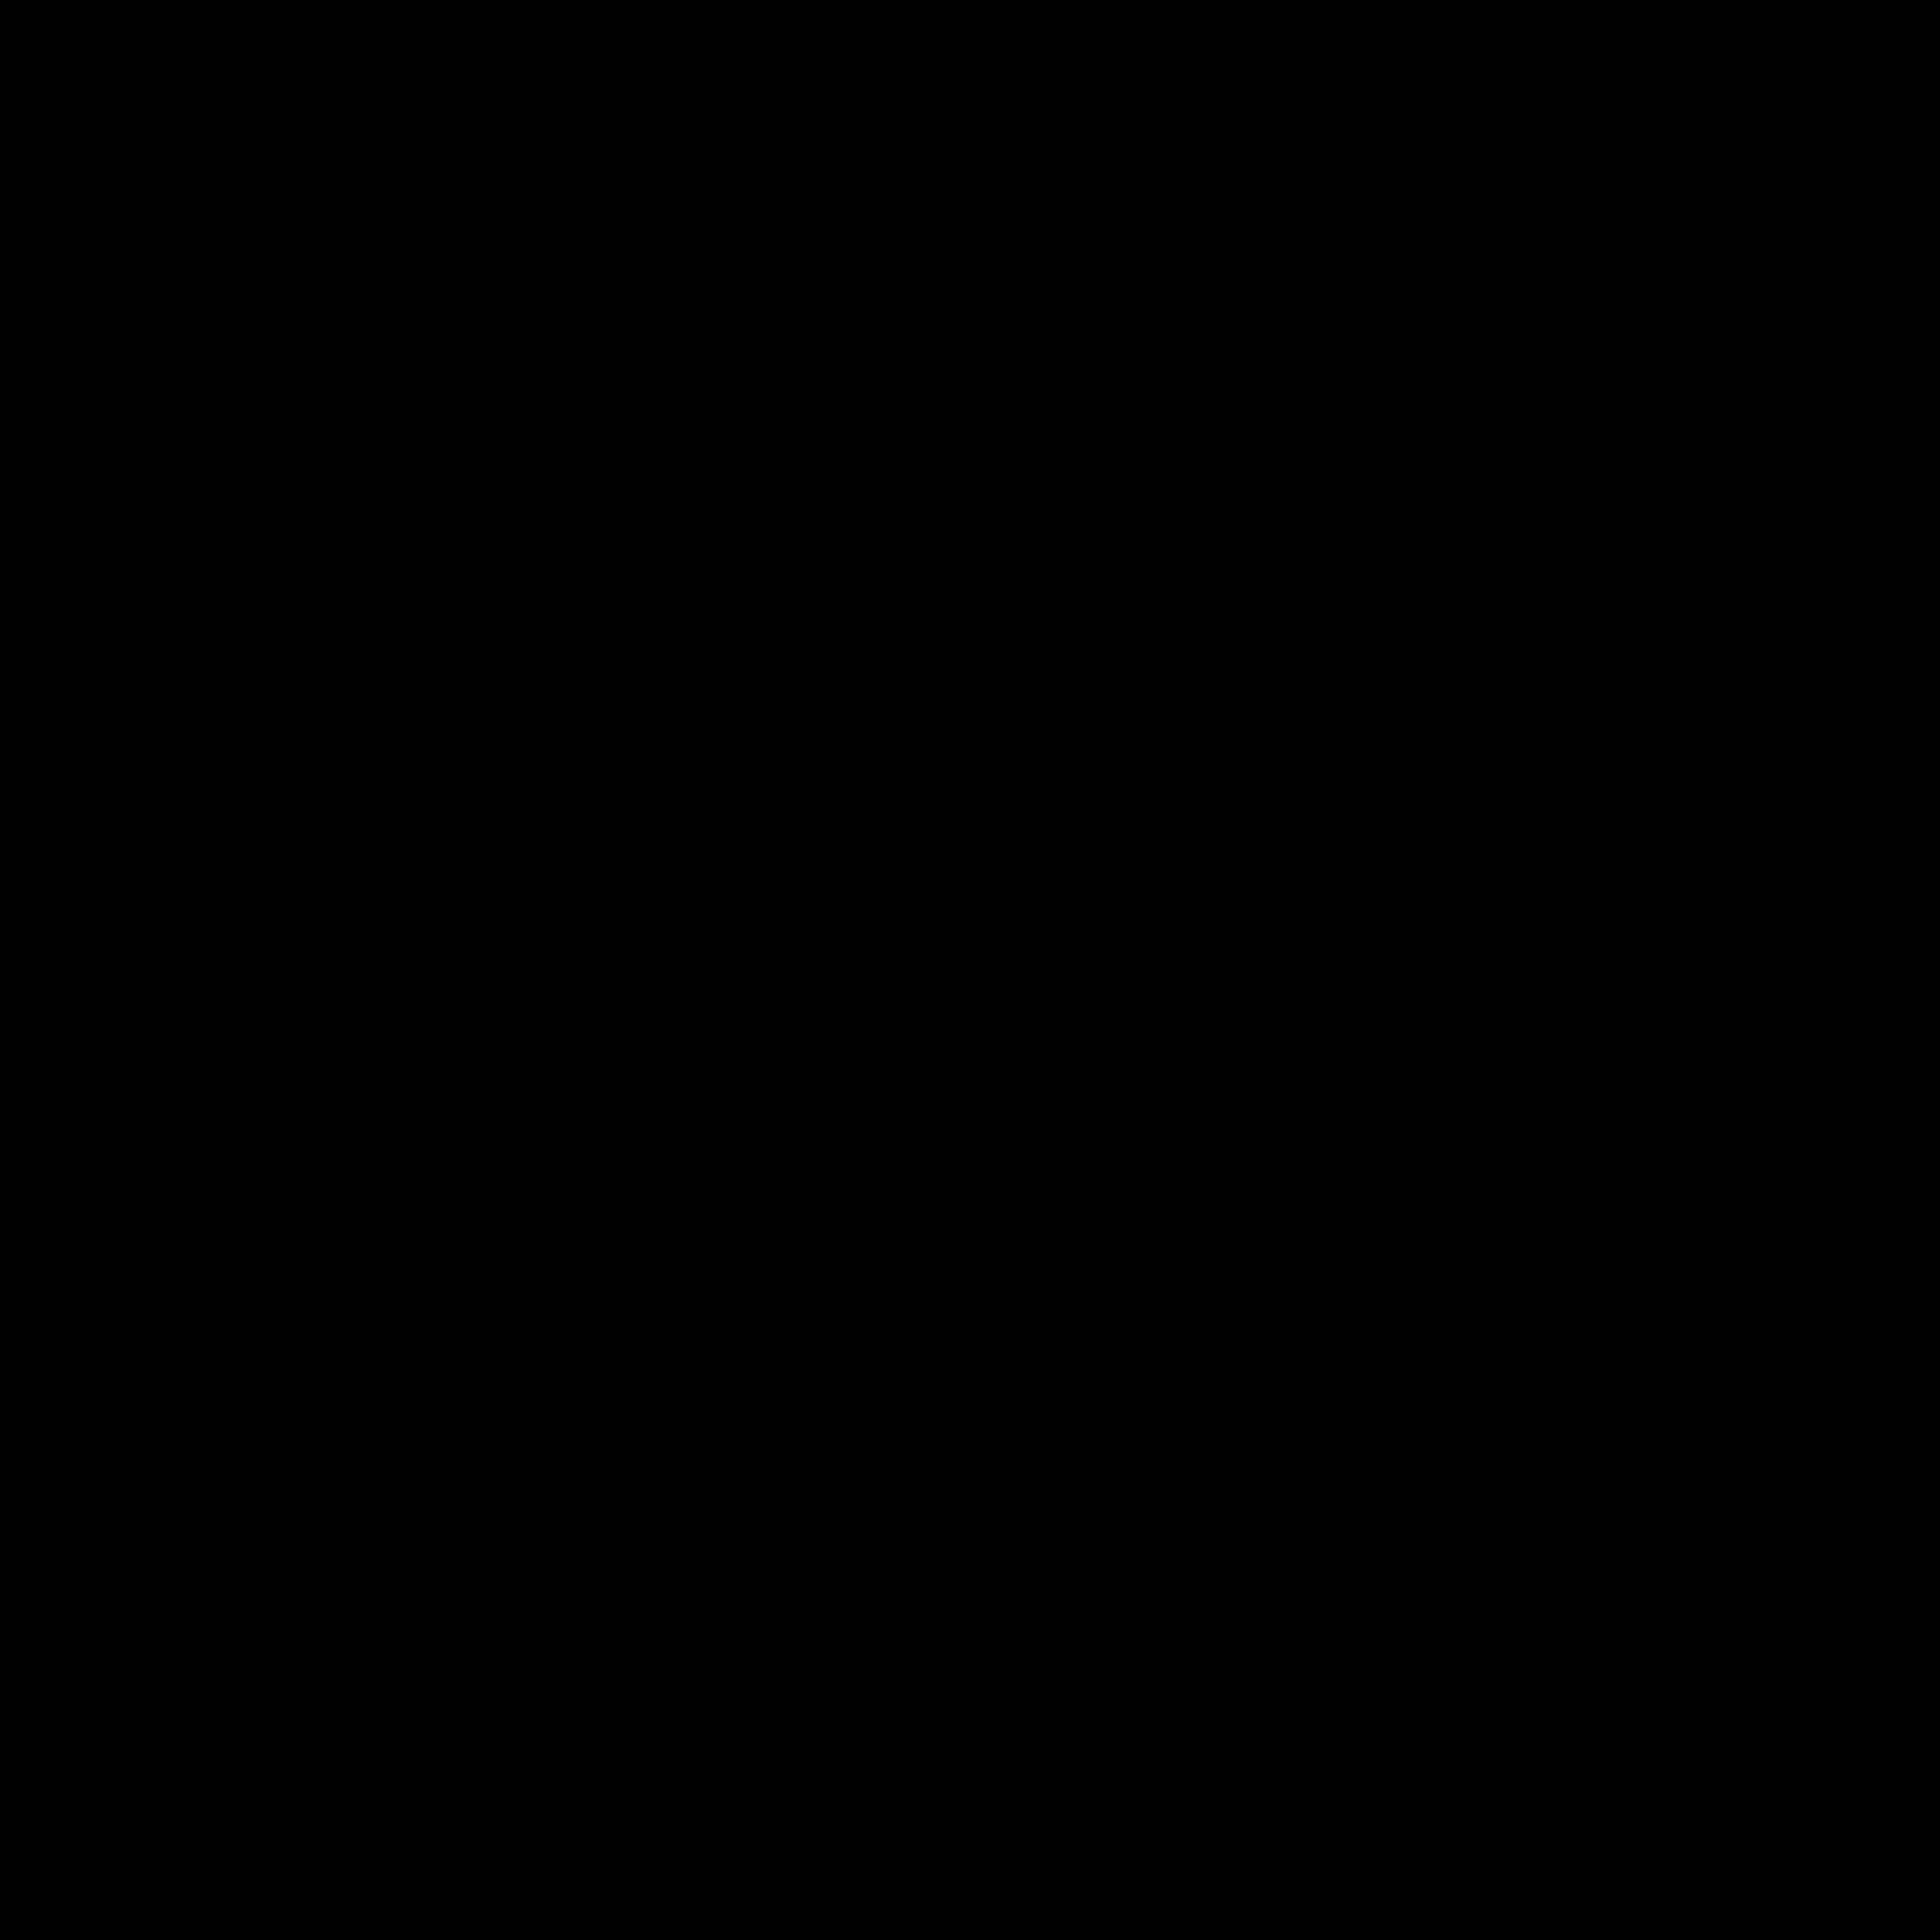 Website clipart web icon. Development logo clip art